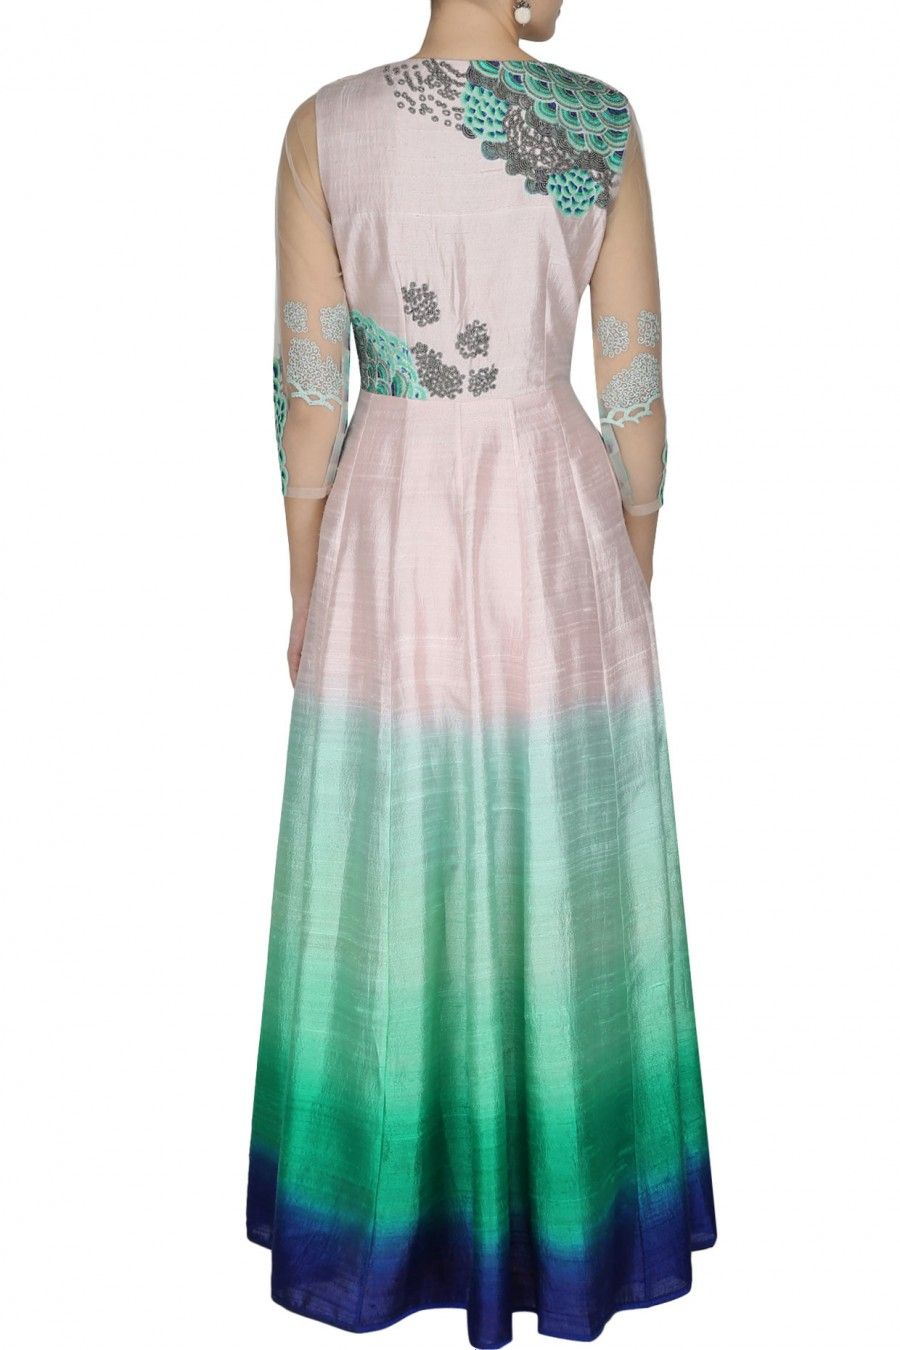 Top dresses to wear to a wedding  Ashutosh Murarka  Dress  Pinterest  Online fashion stores Blue